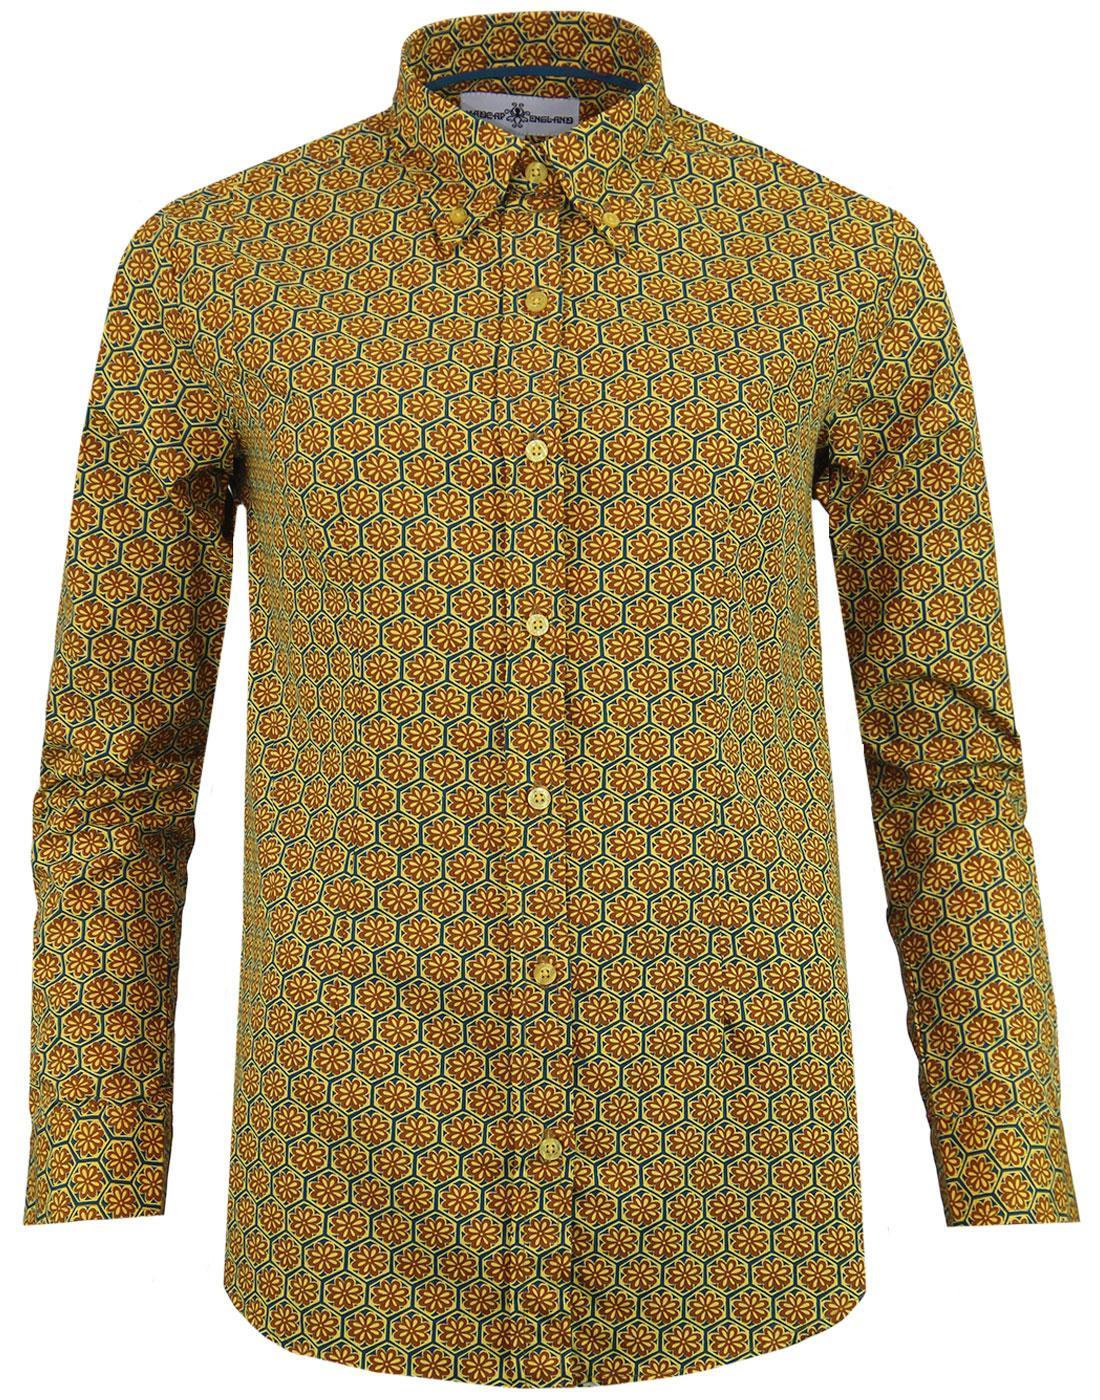 madcap england saffron floral hexagon shirt teal